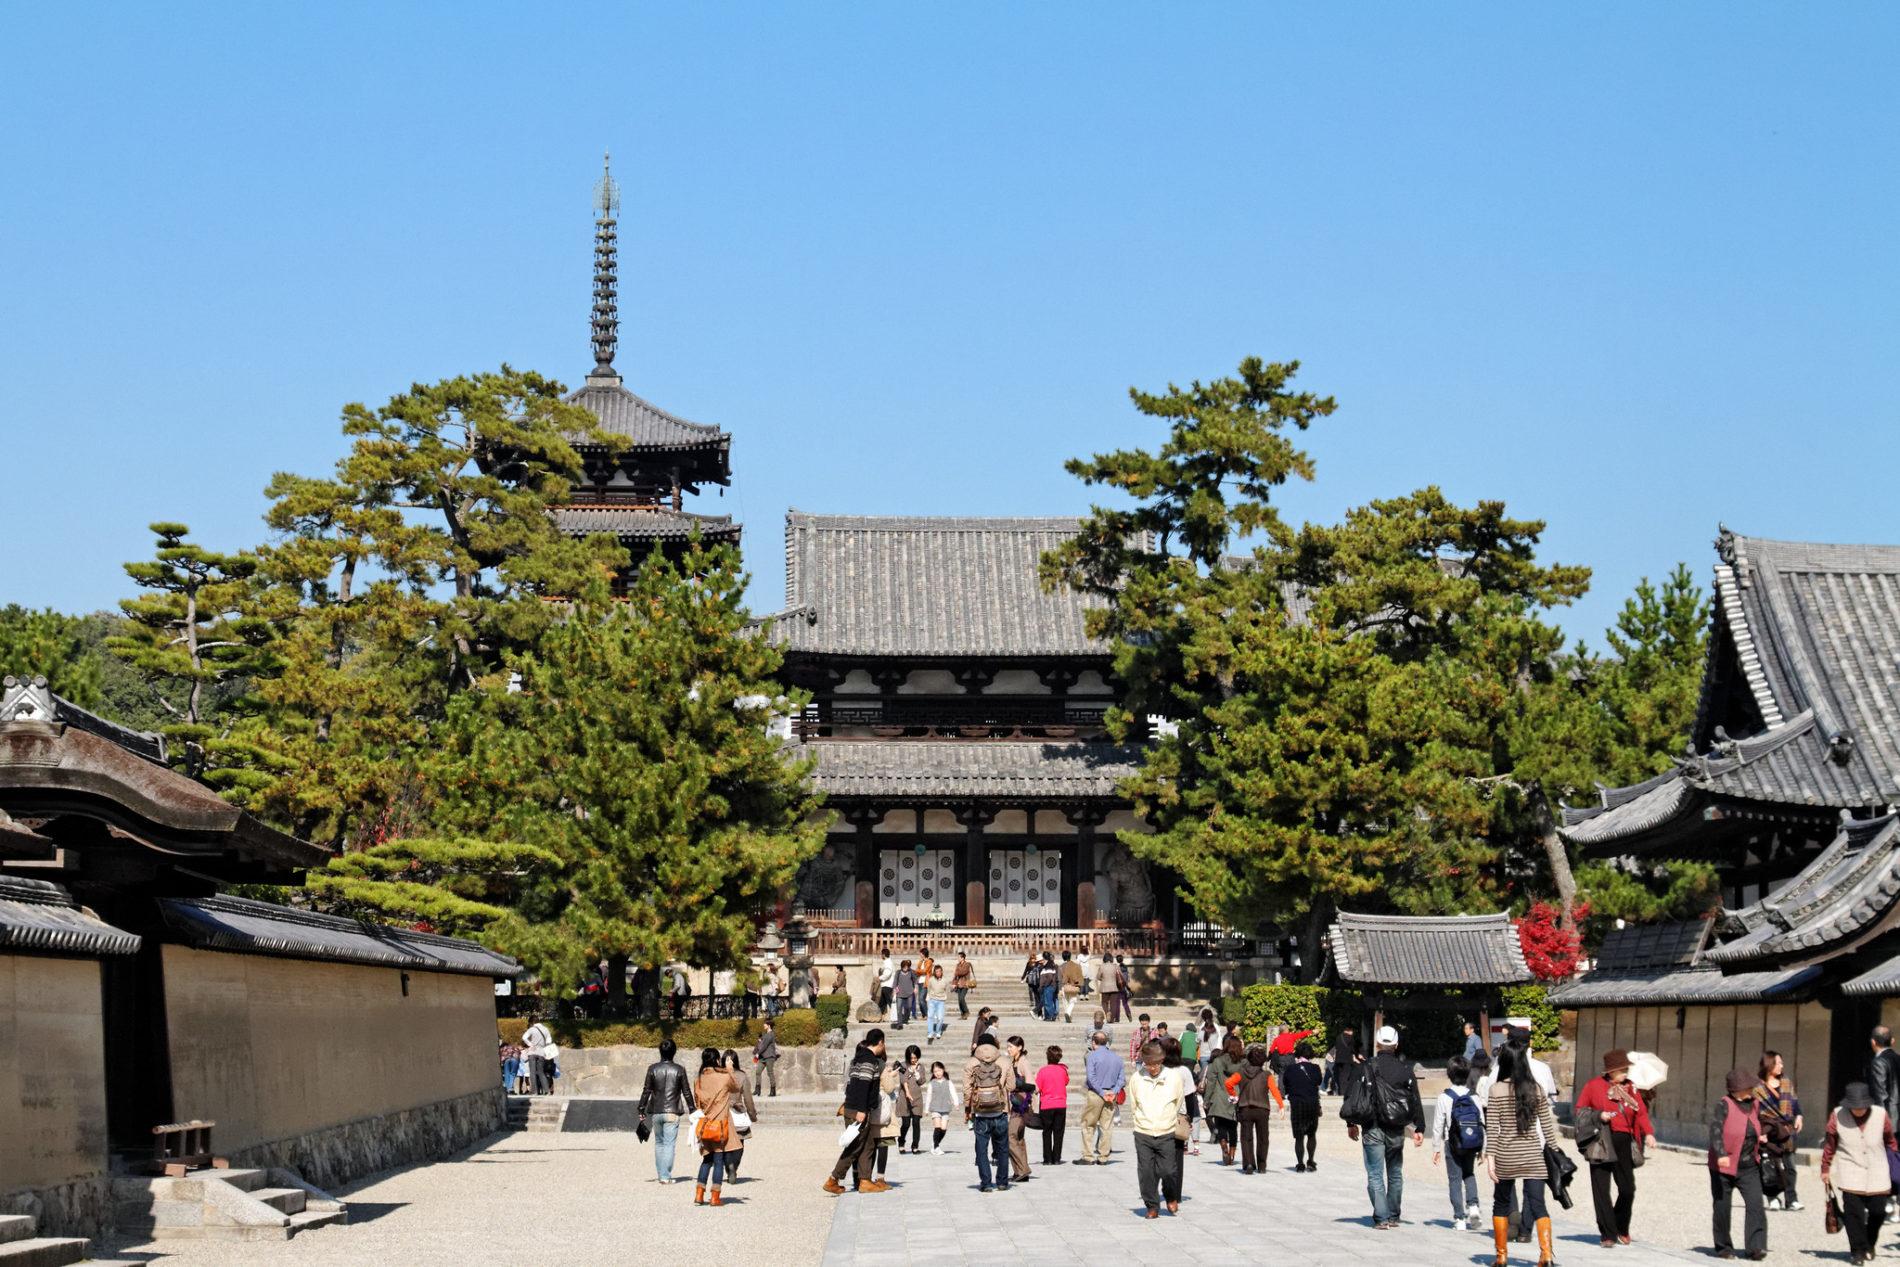 Die älteste Holzpagode Japans steht am Horyu-ji Tempel in der Präfektur Nara.